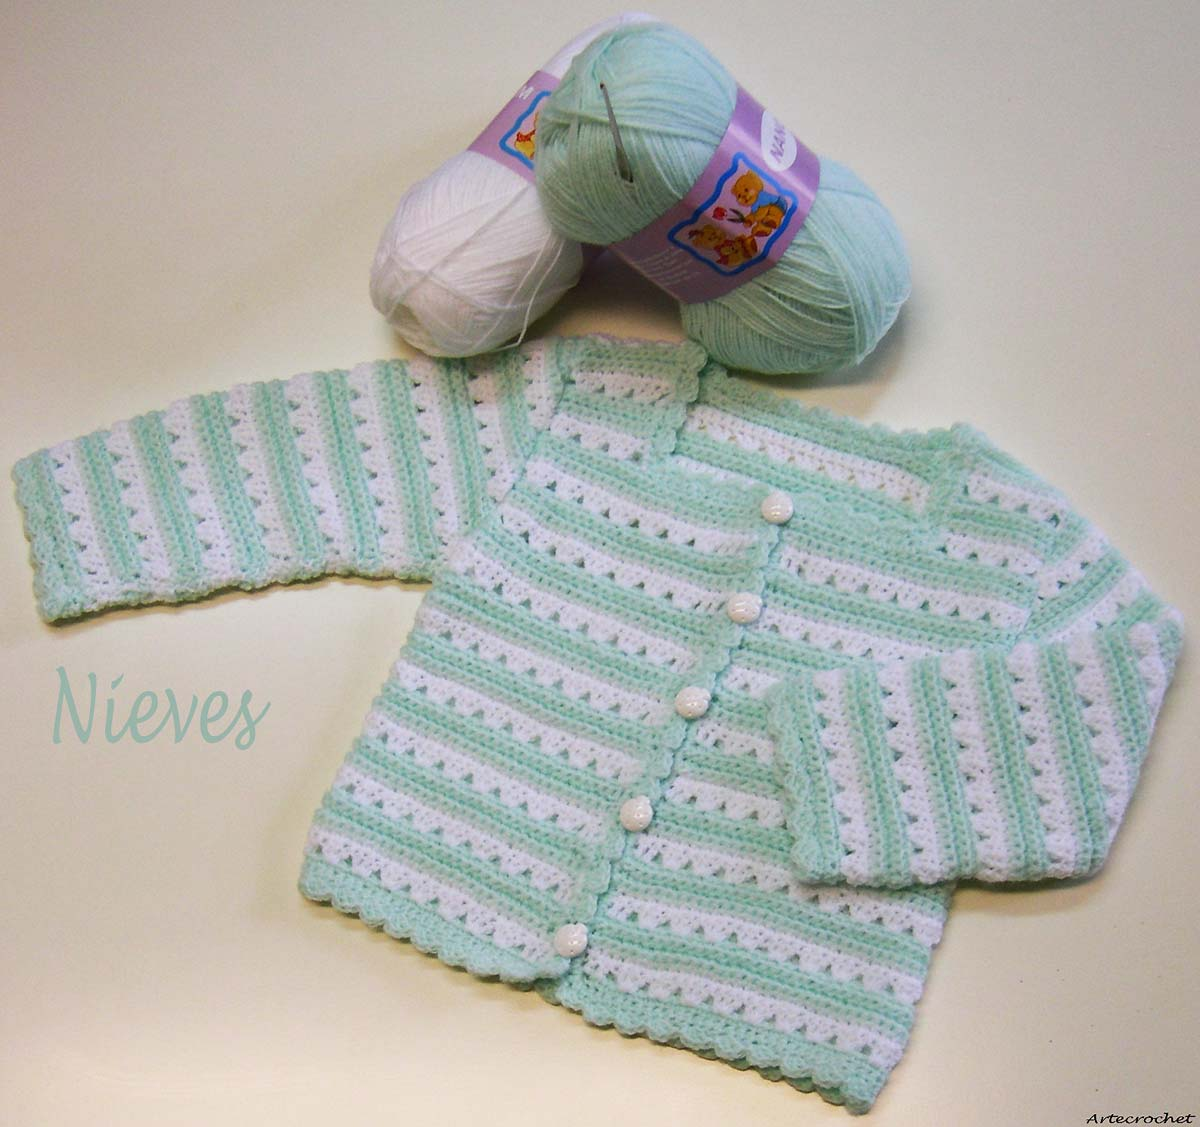 Artecrochet nieves chaqueta para beb de 3 a 6 meses - Tejer chaqueta bebe 6 meses ...